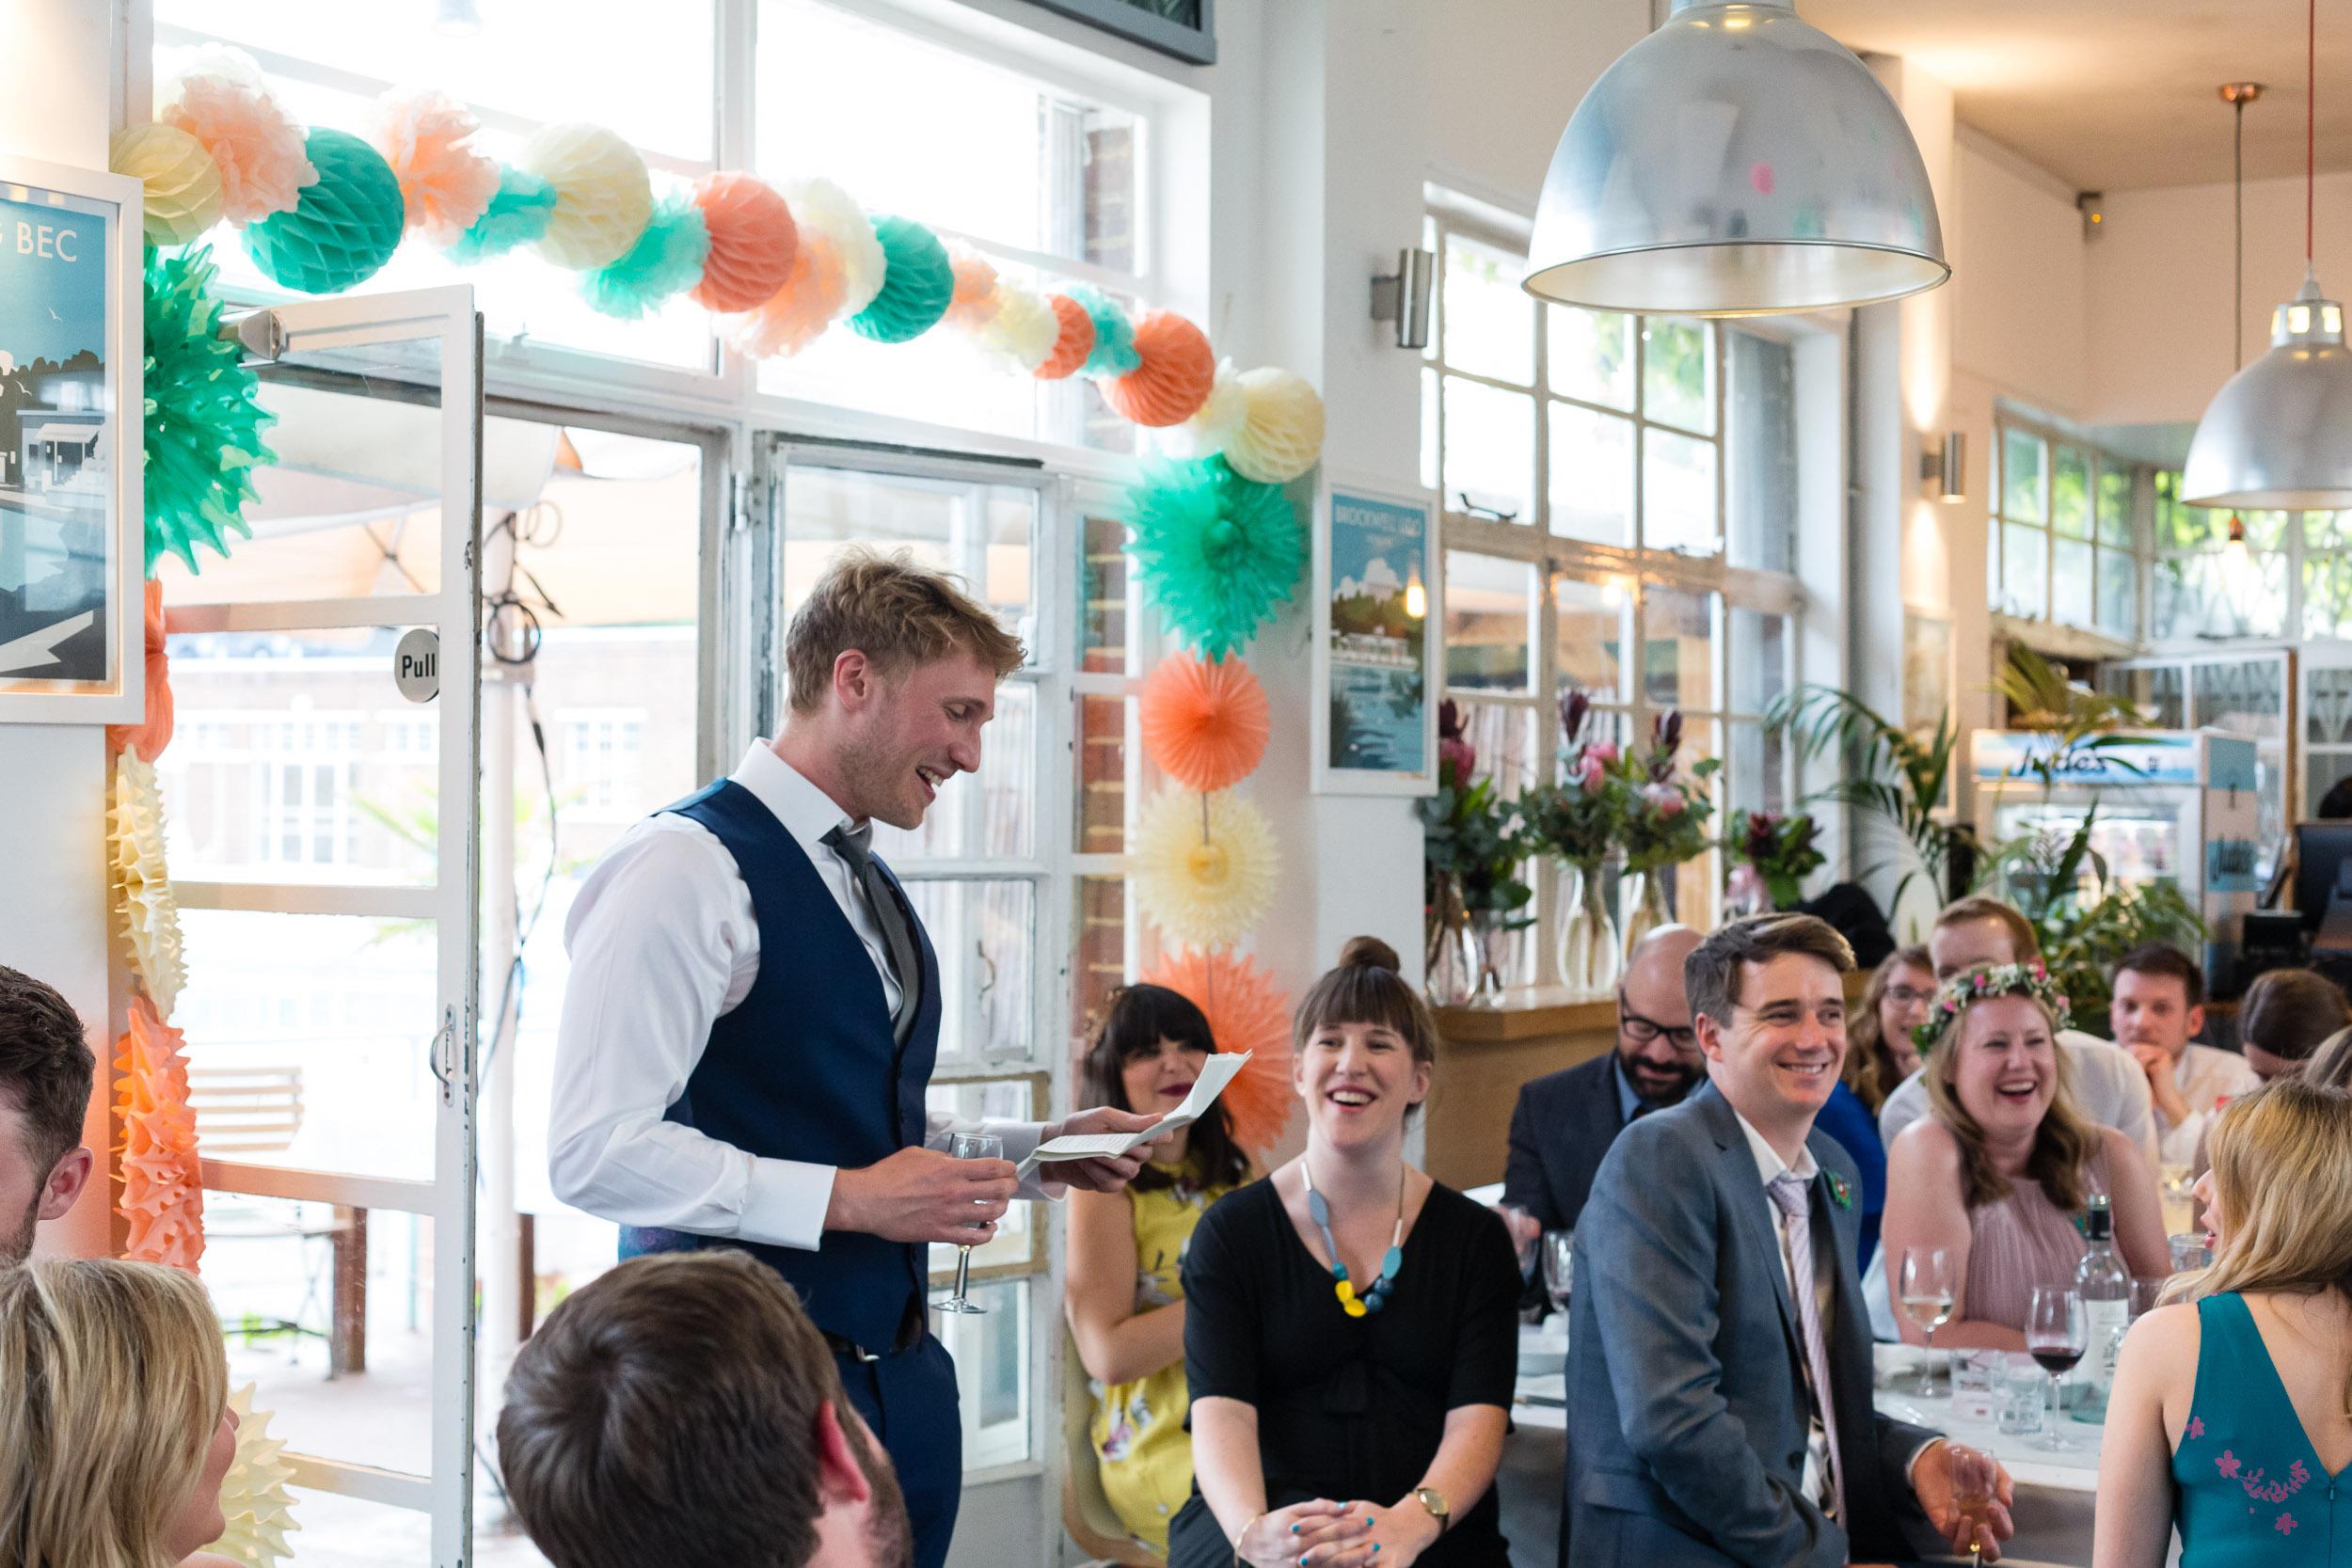 brockwell-lido-brixton-herne-hill-wedding-360.jpg